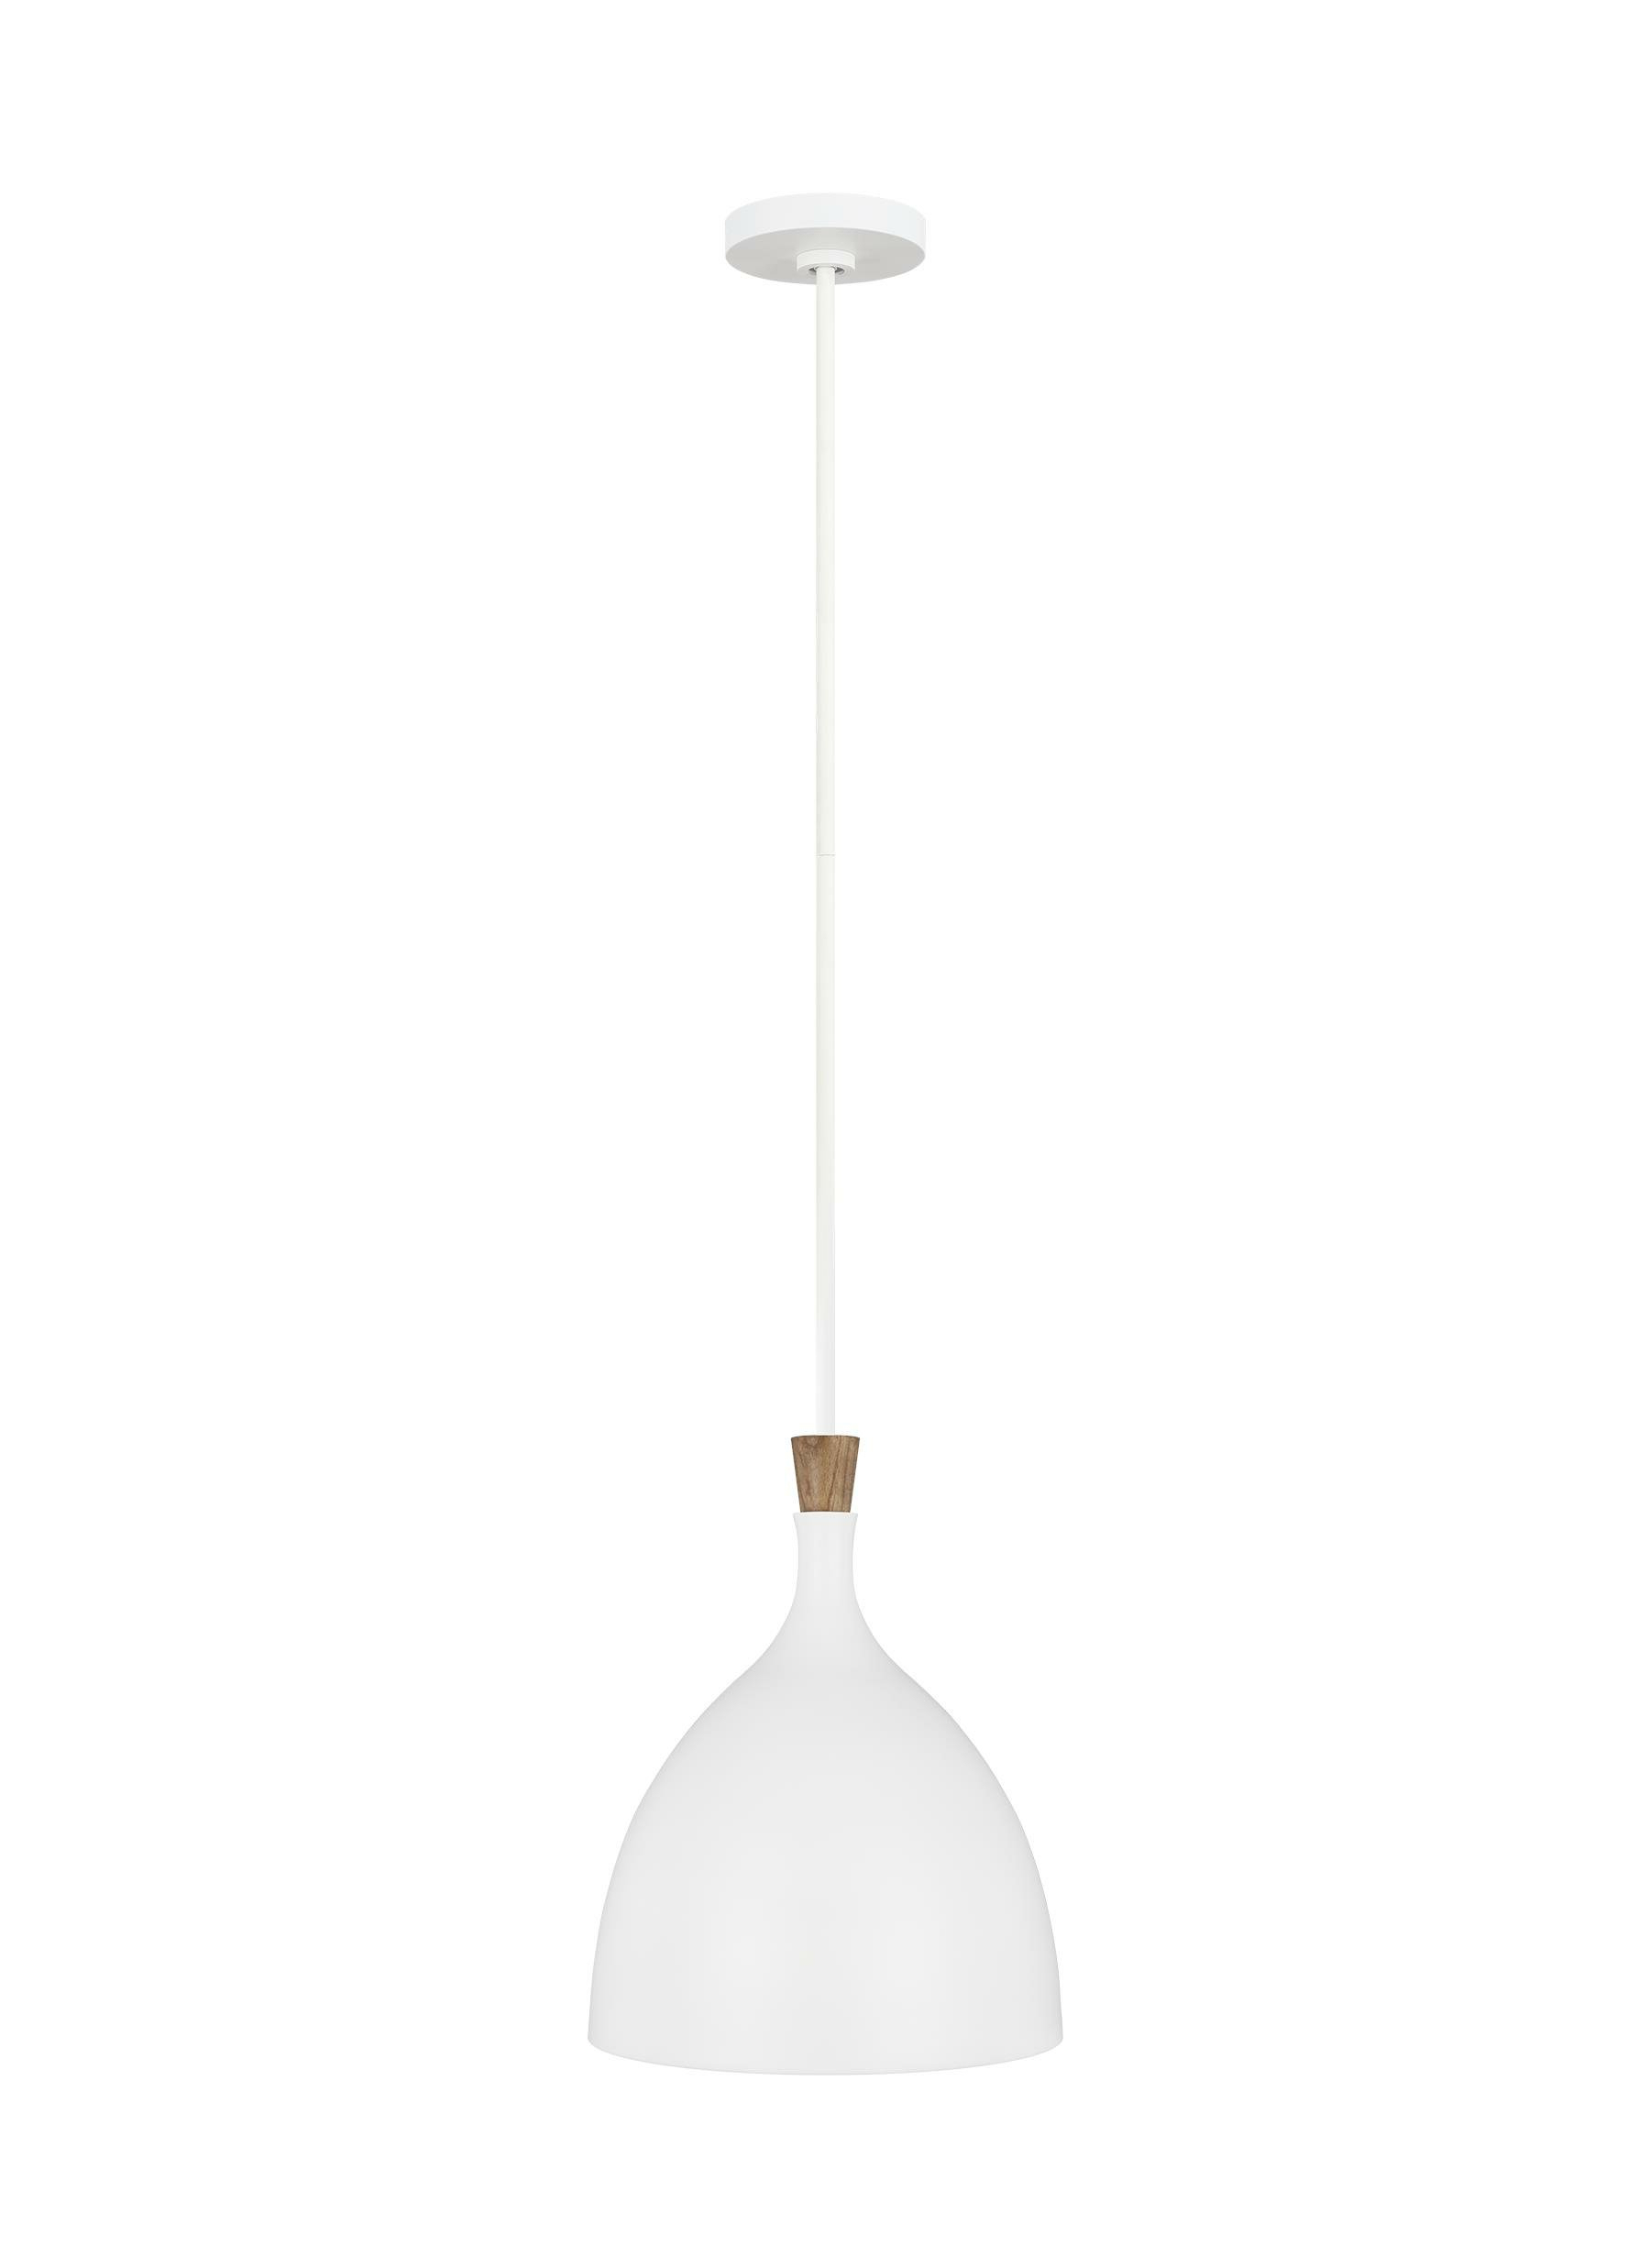 2020 Monadnock 1 Light Single Dome Pendants In Darwin 1 Light Single Dome Pendant (View 1 of 20)